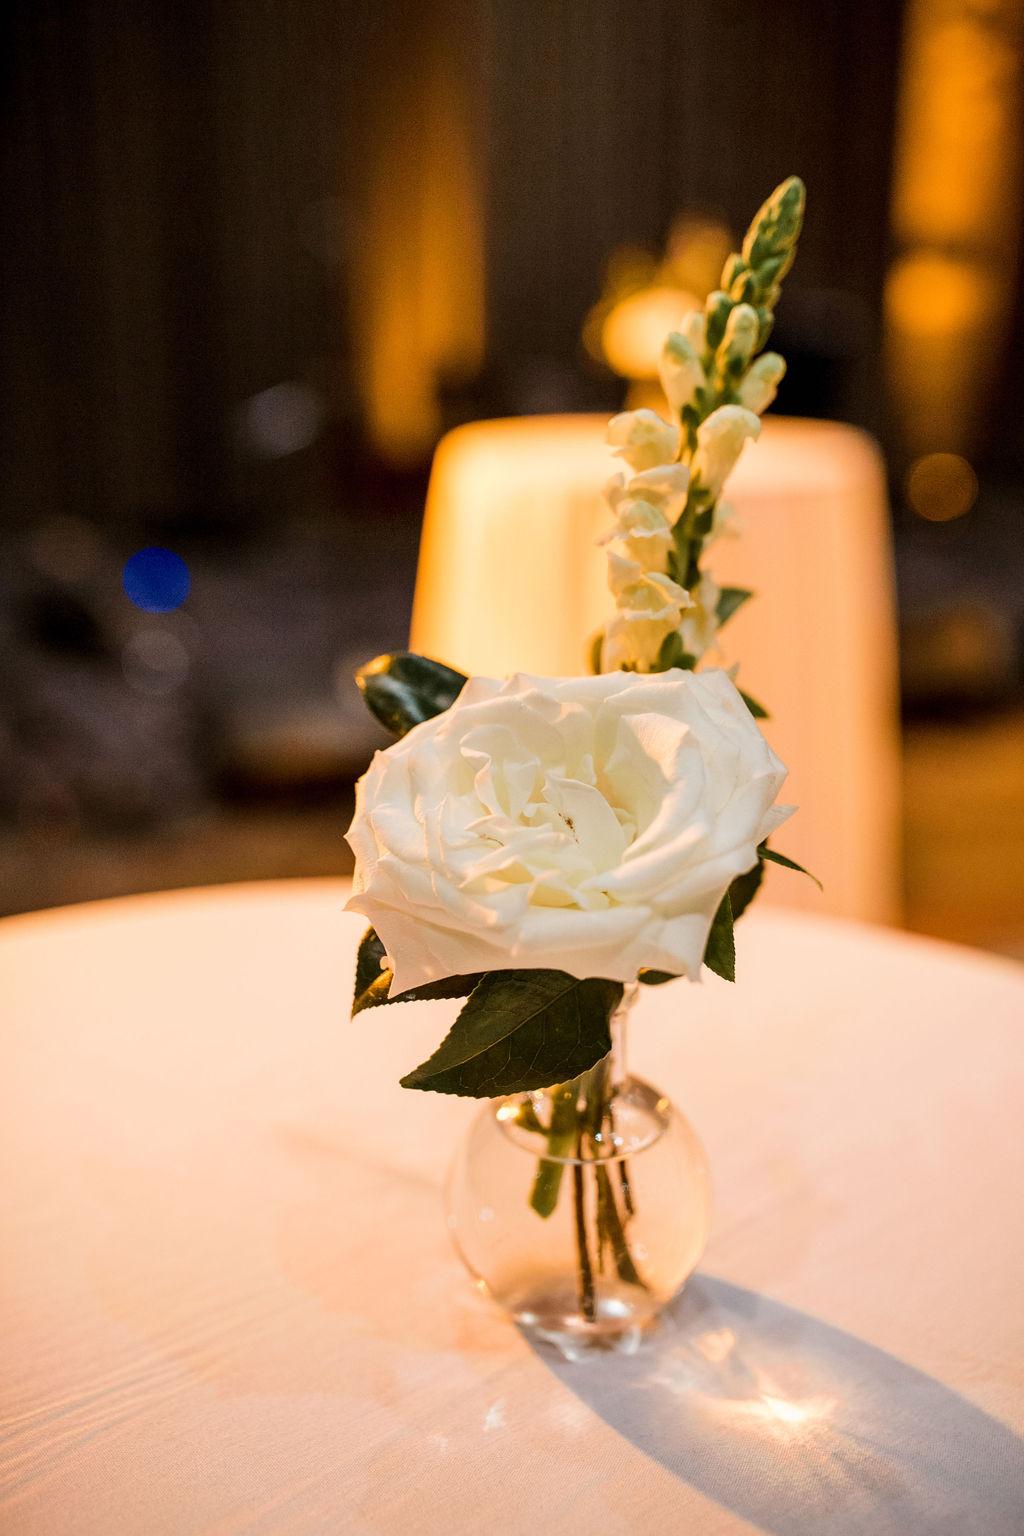 Simple white floral wedding centerpieces: Lavish Union Station Hotel Wedding featured on Nashville Bride Guide